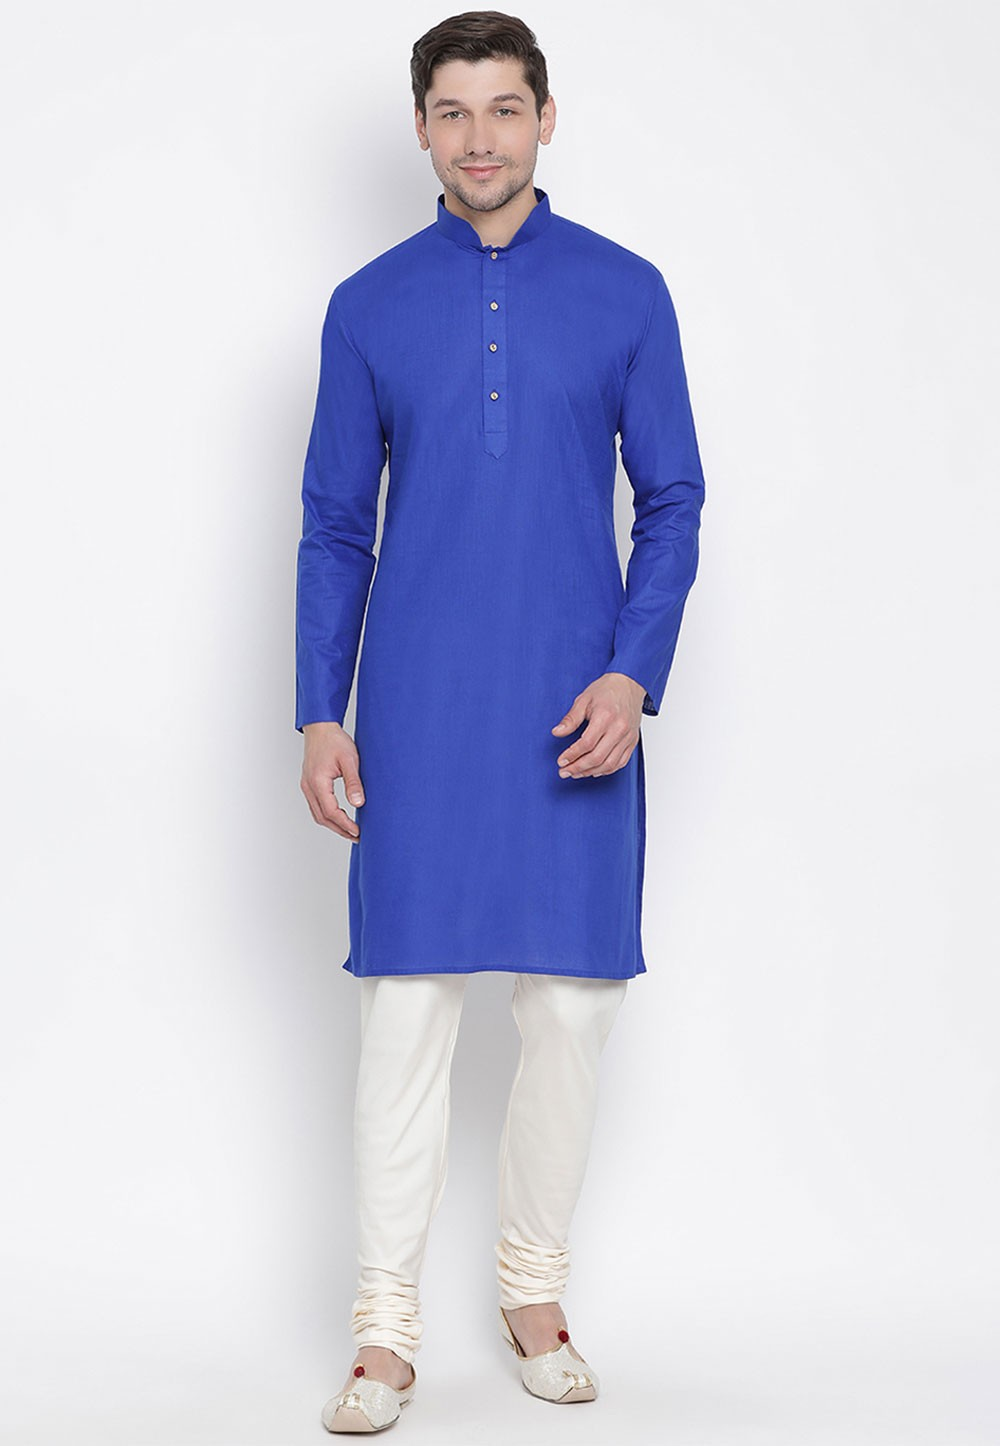 Royal Blue Color Men's Kurta Pyjama.